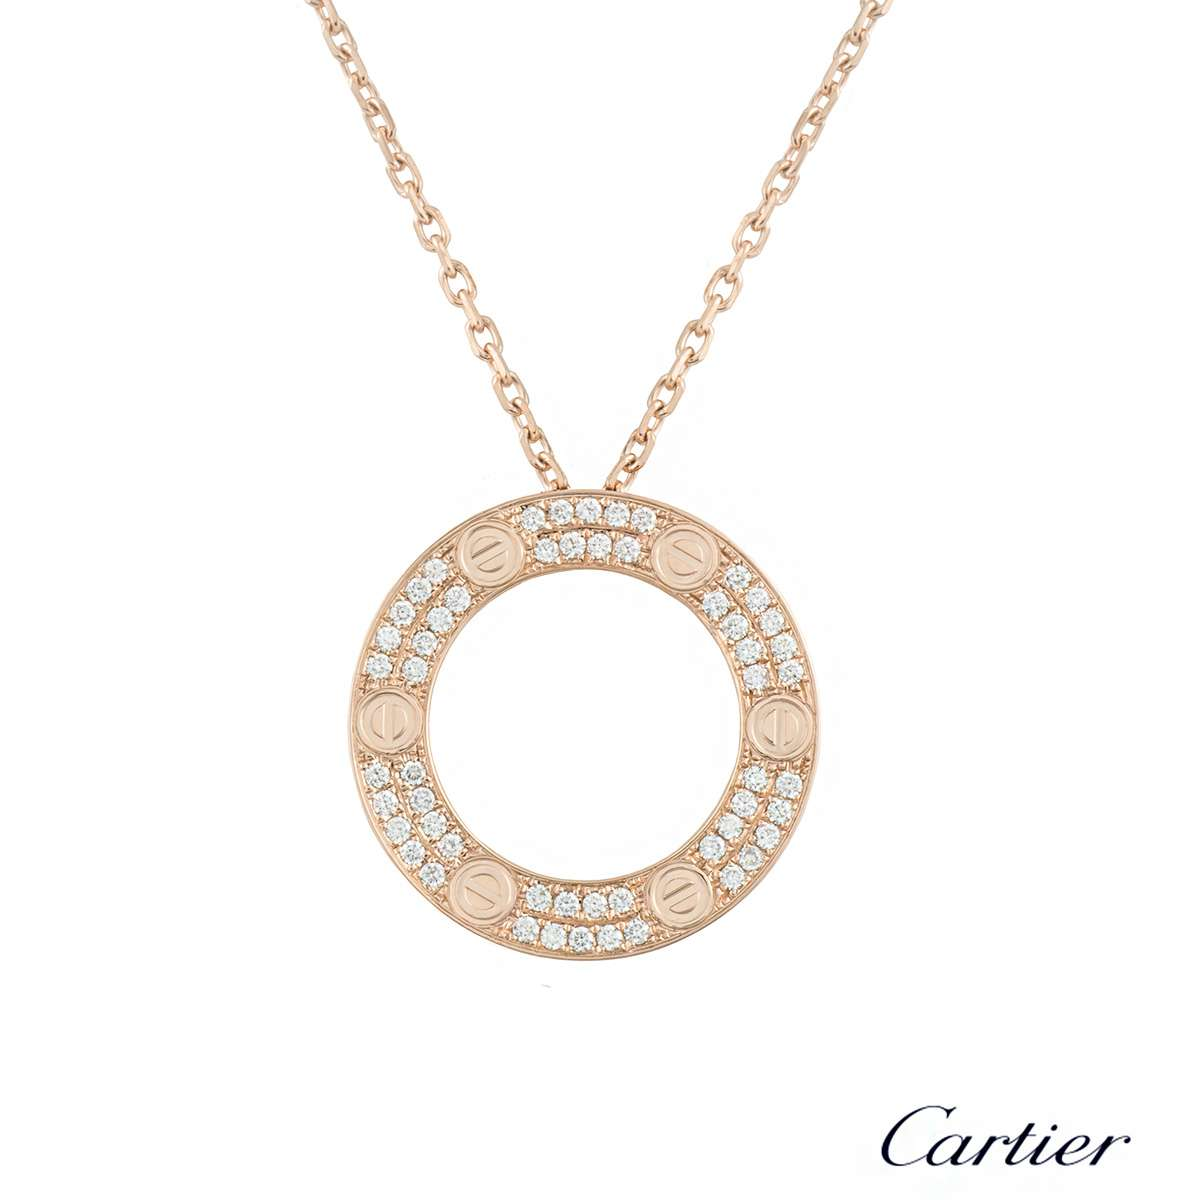 Cartier rose gold diamond love pendant b7224527 rich diamonds of cartier rose gold diamond love pendant b7224527 aloadofball Choice Image